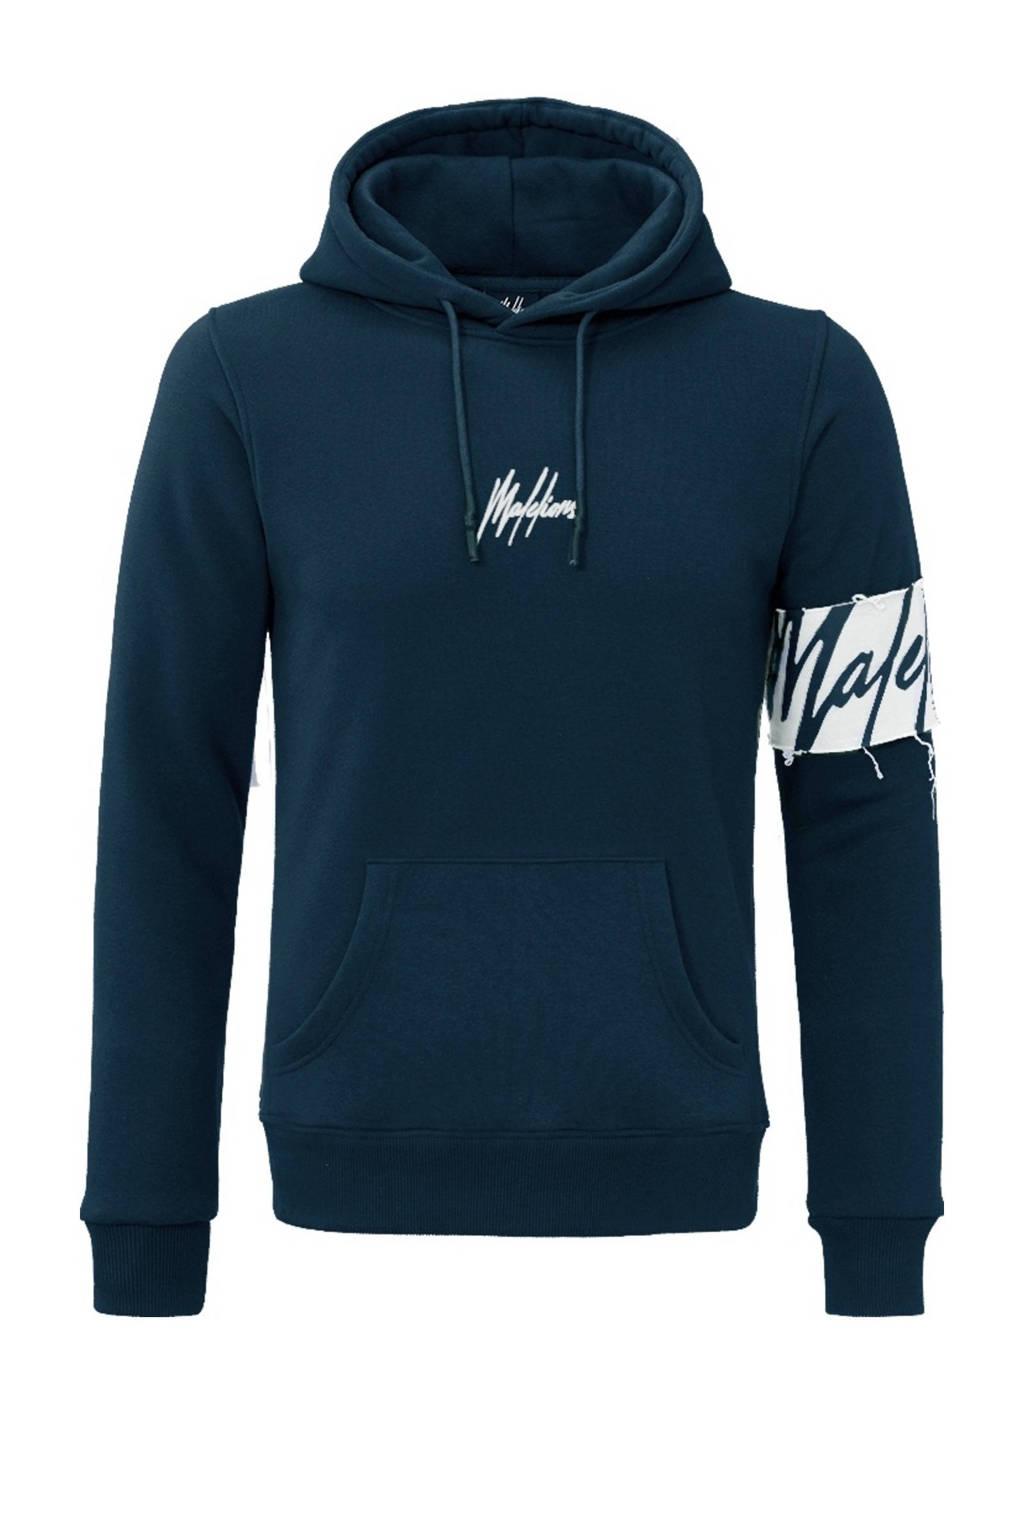 Malelions hoodie met logo donkerblauw, Donkerblauw